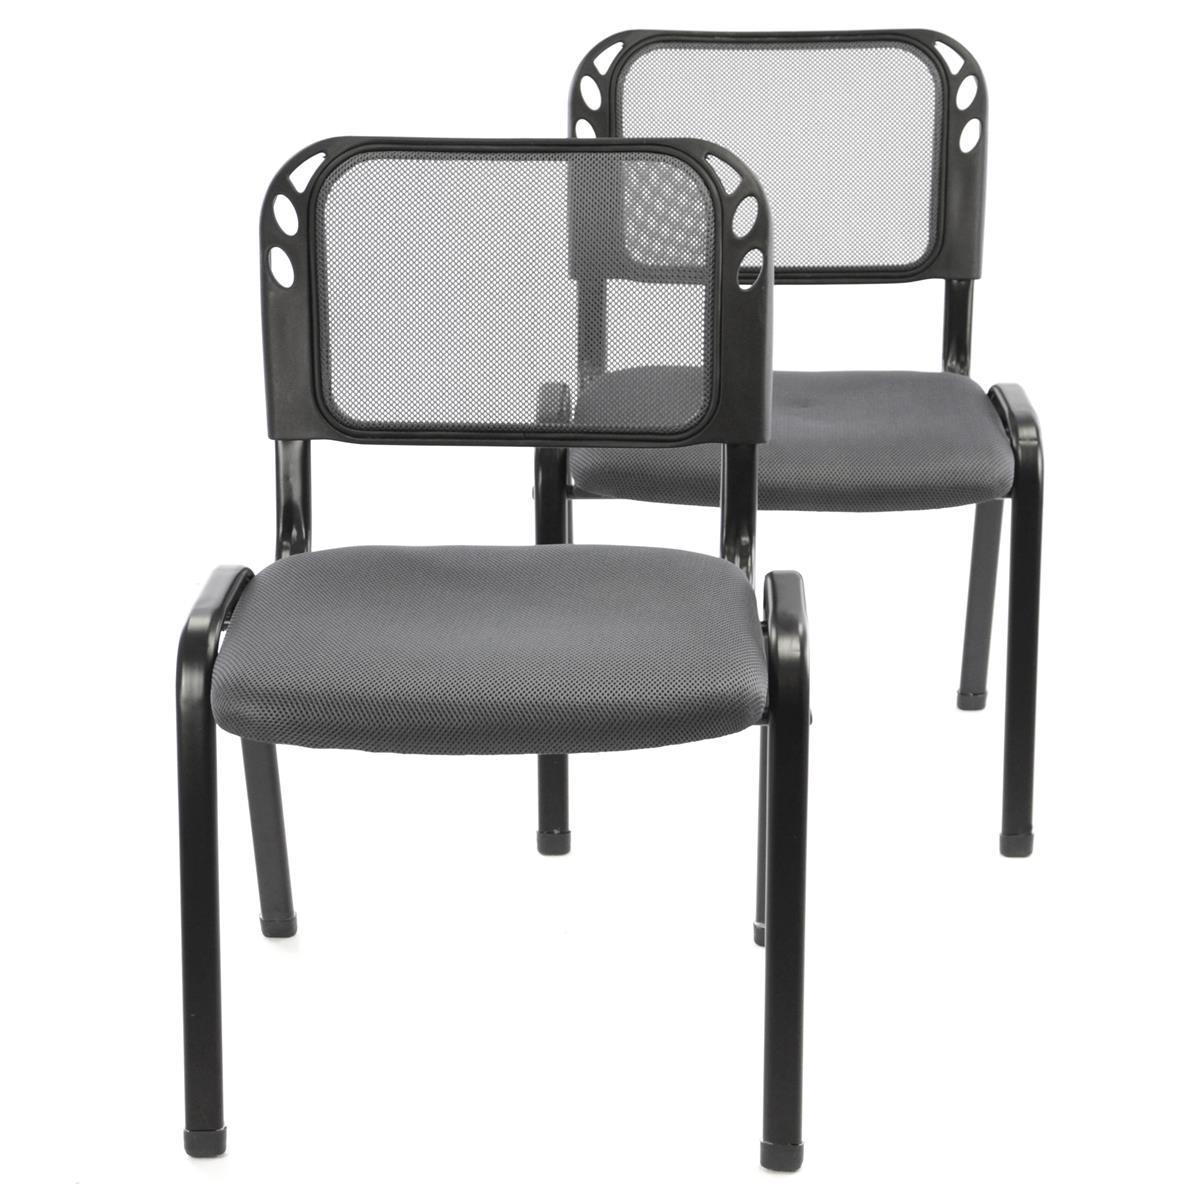 Besucherstuhl 2er Set Bürostuhl Konferenzstuhl Sitzfläche Grau gepolstert